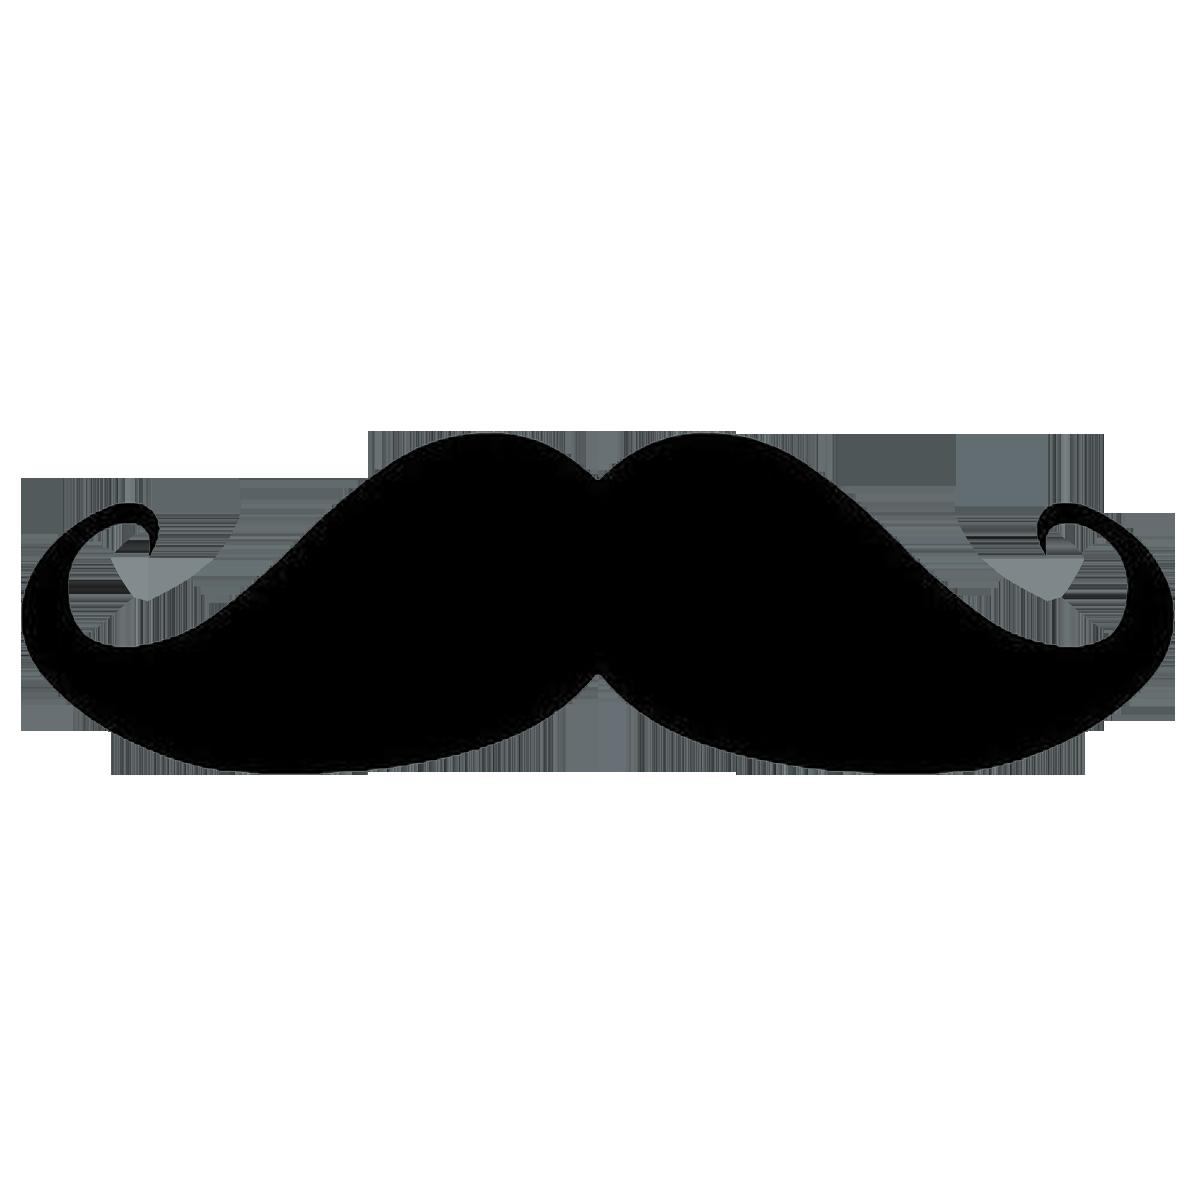 Moustache clipart mustache chinese. Desktop wallpaper display resolution